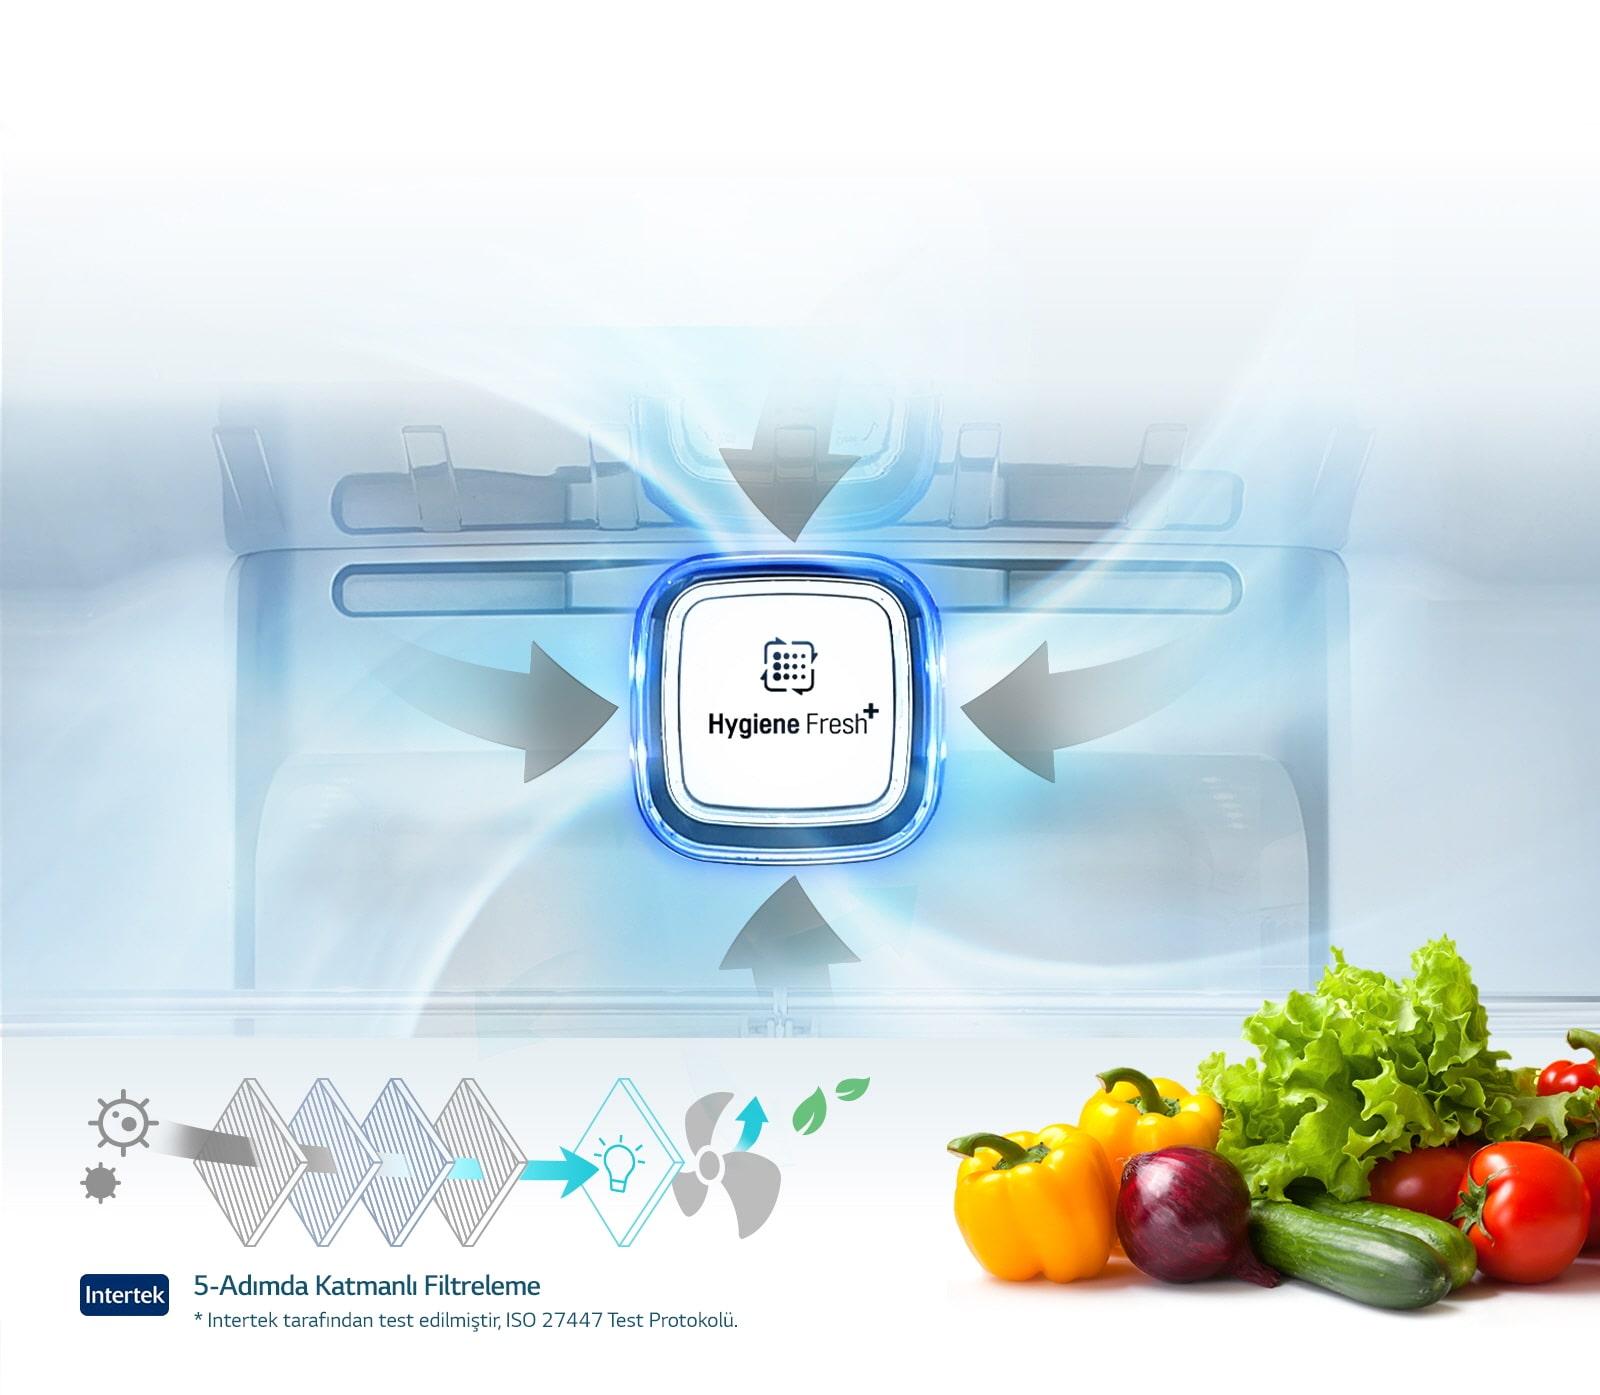 Hygiene Fresh+™ ile %2525252599.999 TAZE HAVA